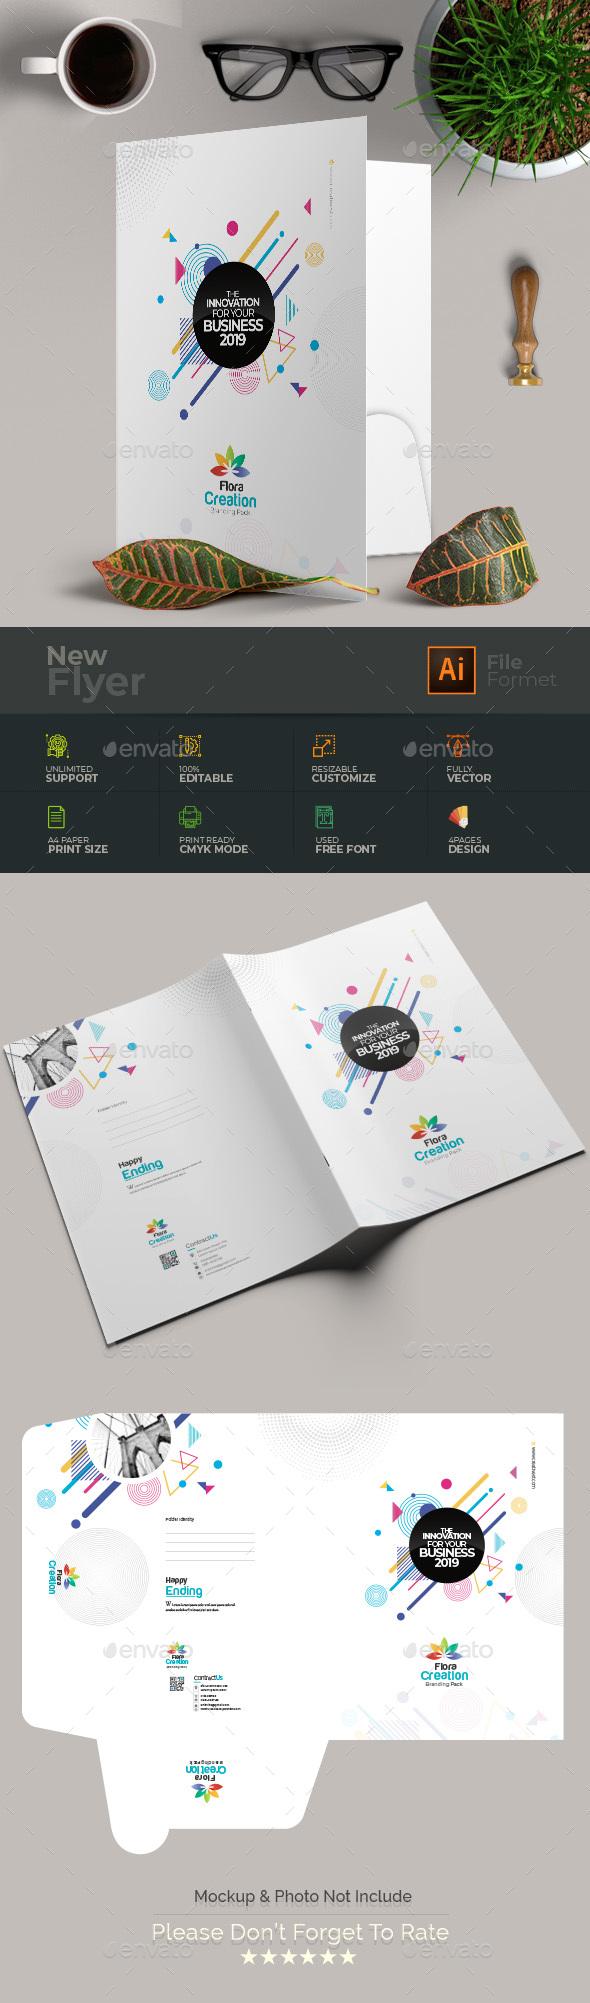 Presentation Folder - Stationery Print Templates